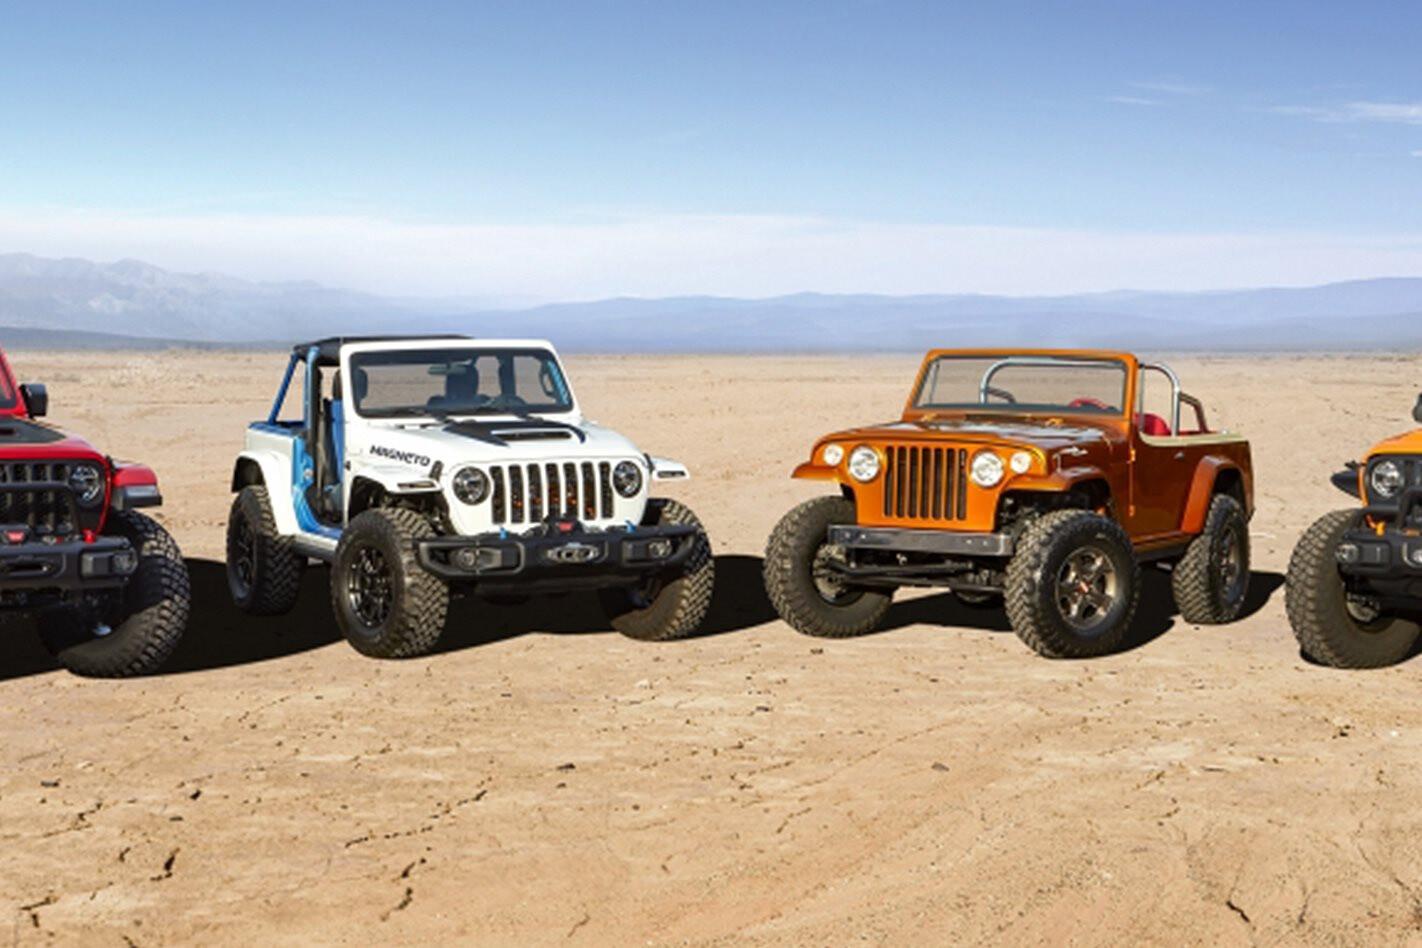 Jeep Easter Safari Concept Vehicles 2 Jpg